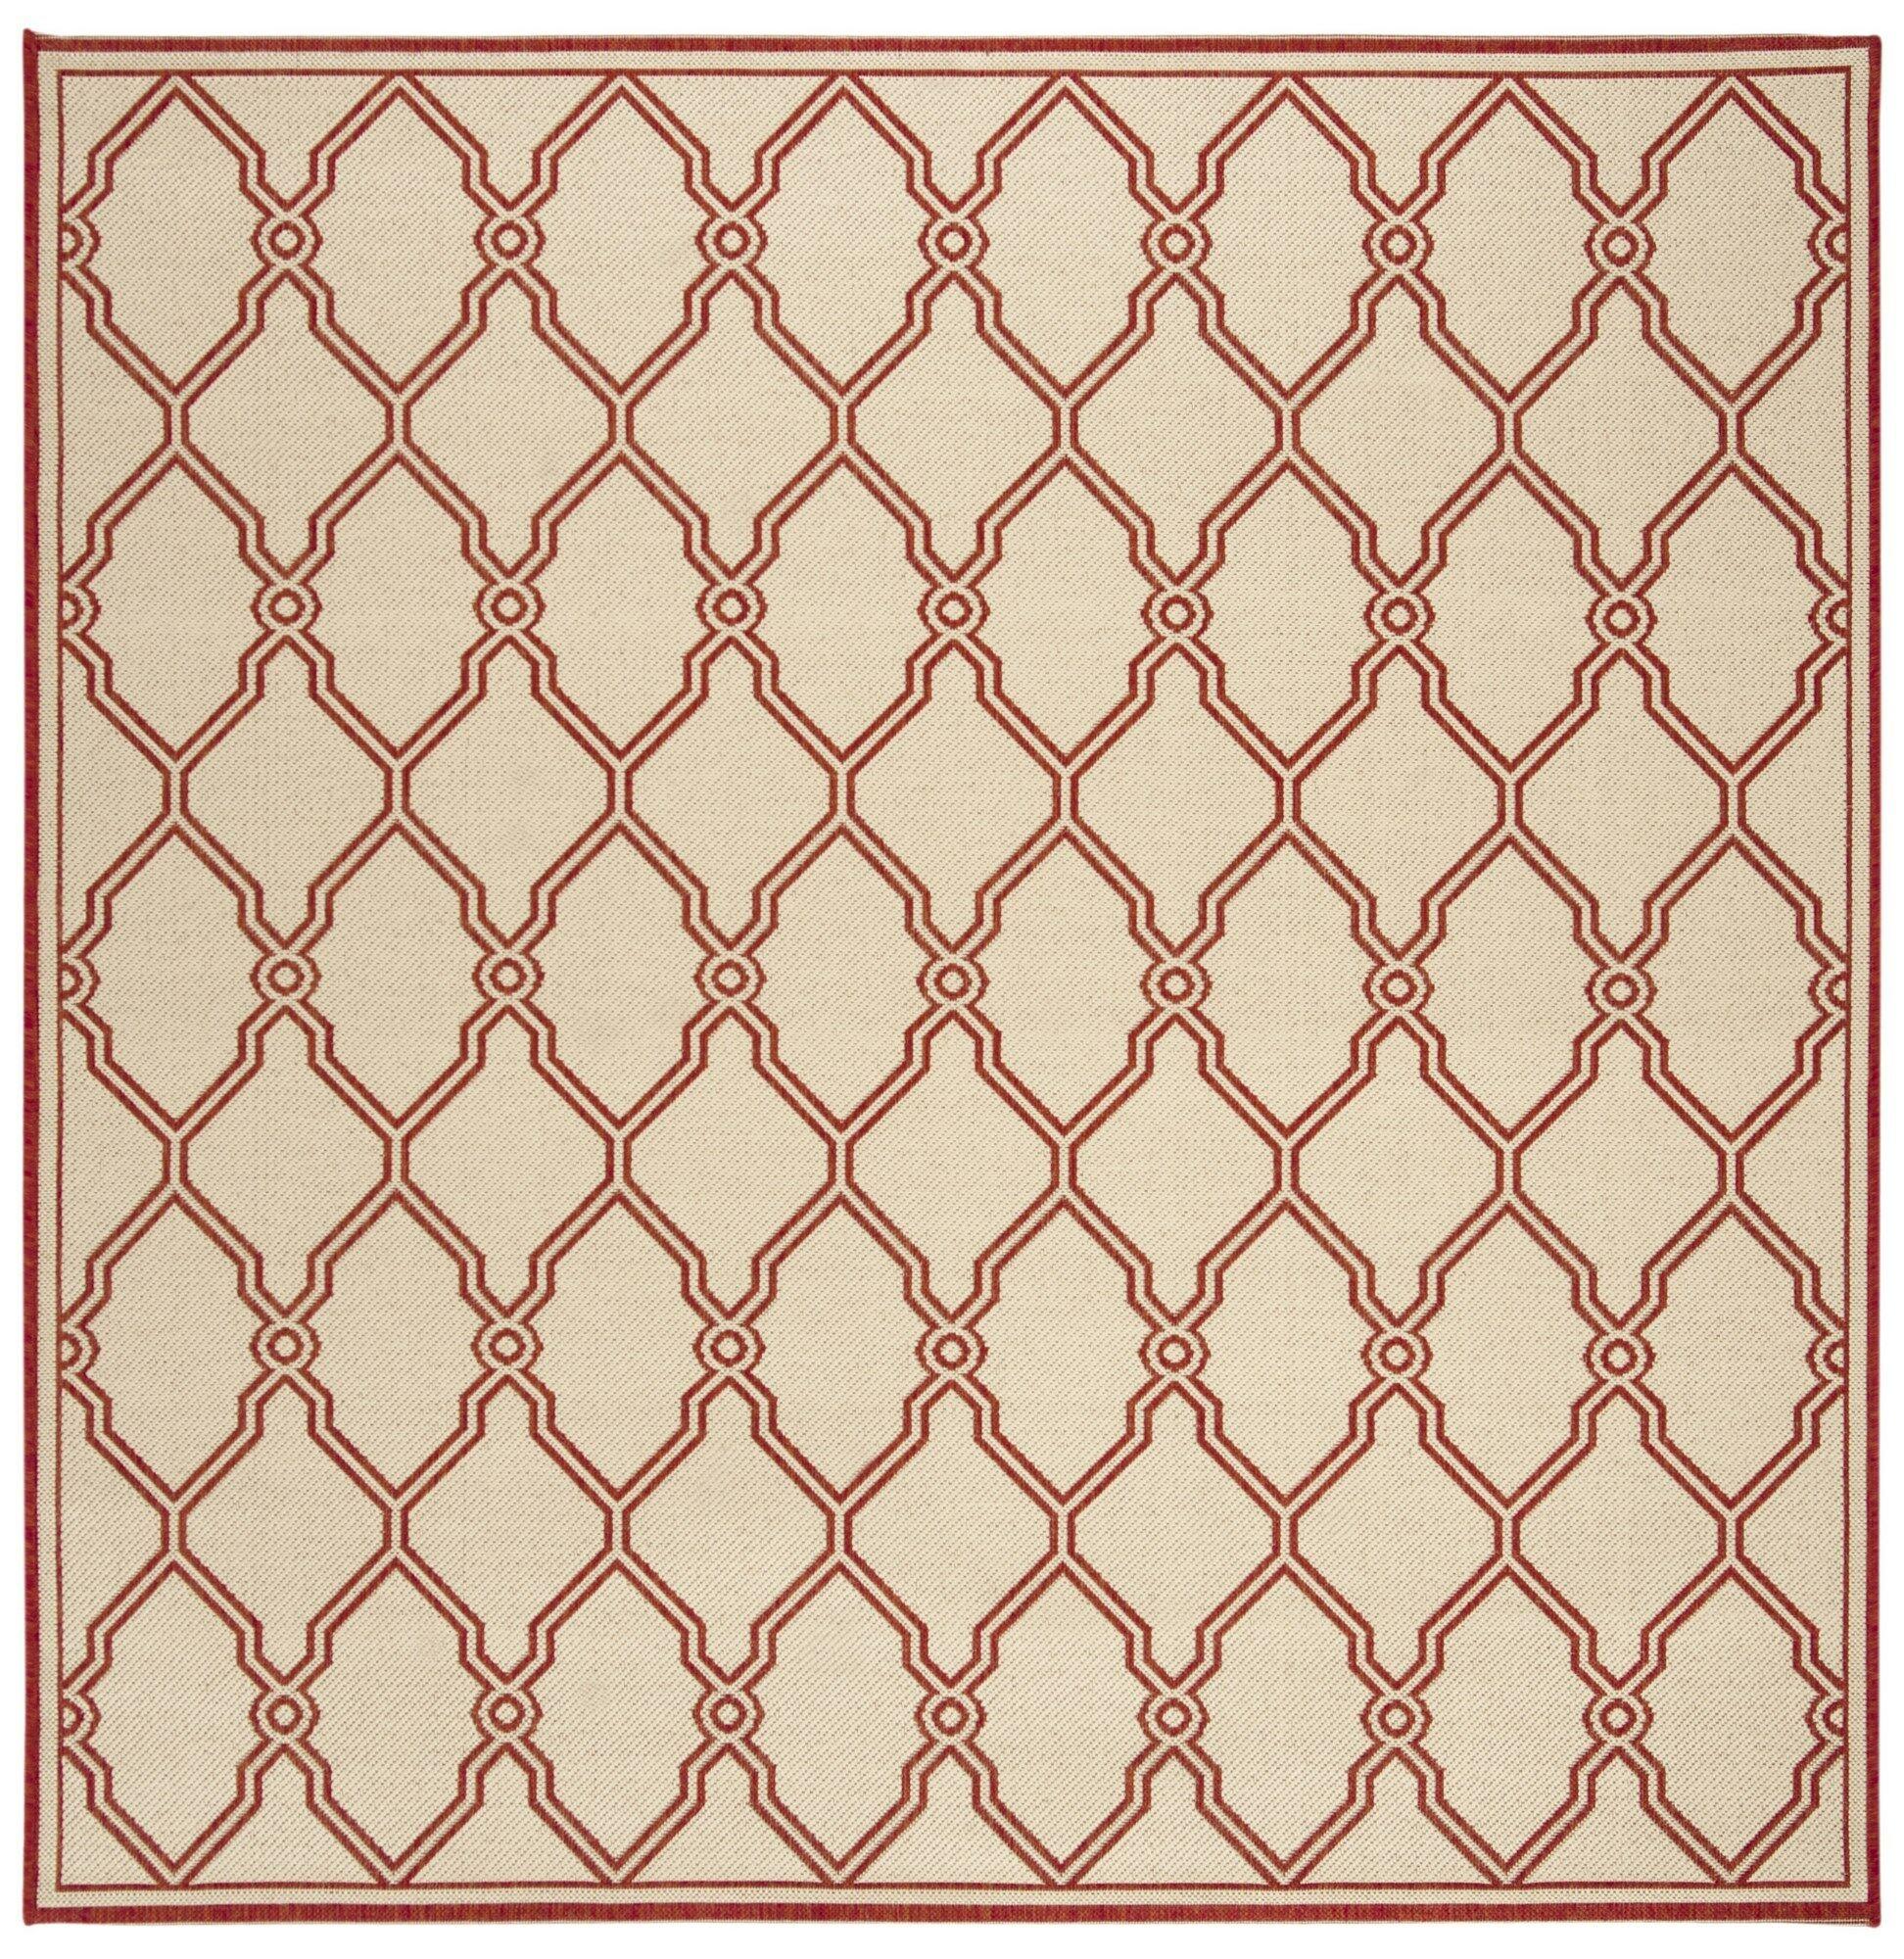 Karpinski Red/Cream Area Rug Rug Size: Square 6'7